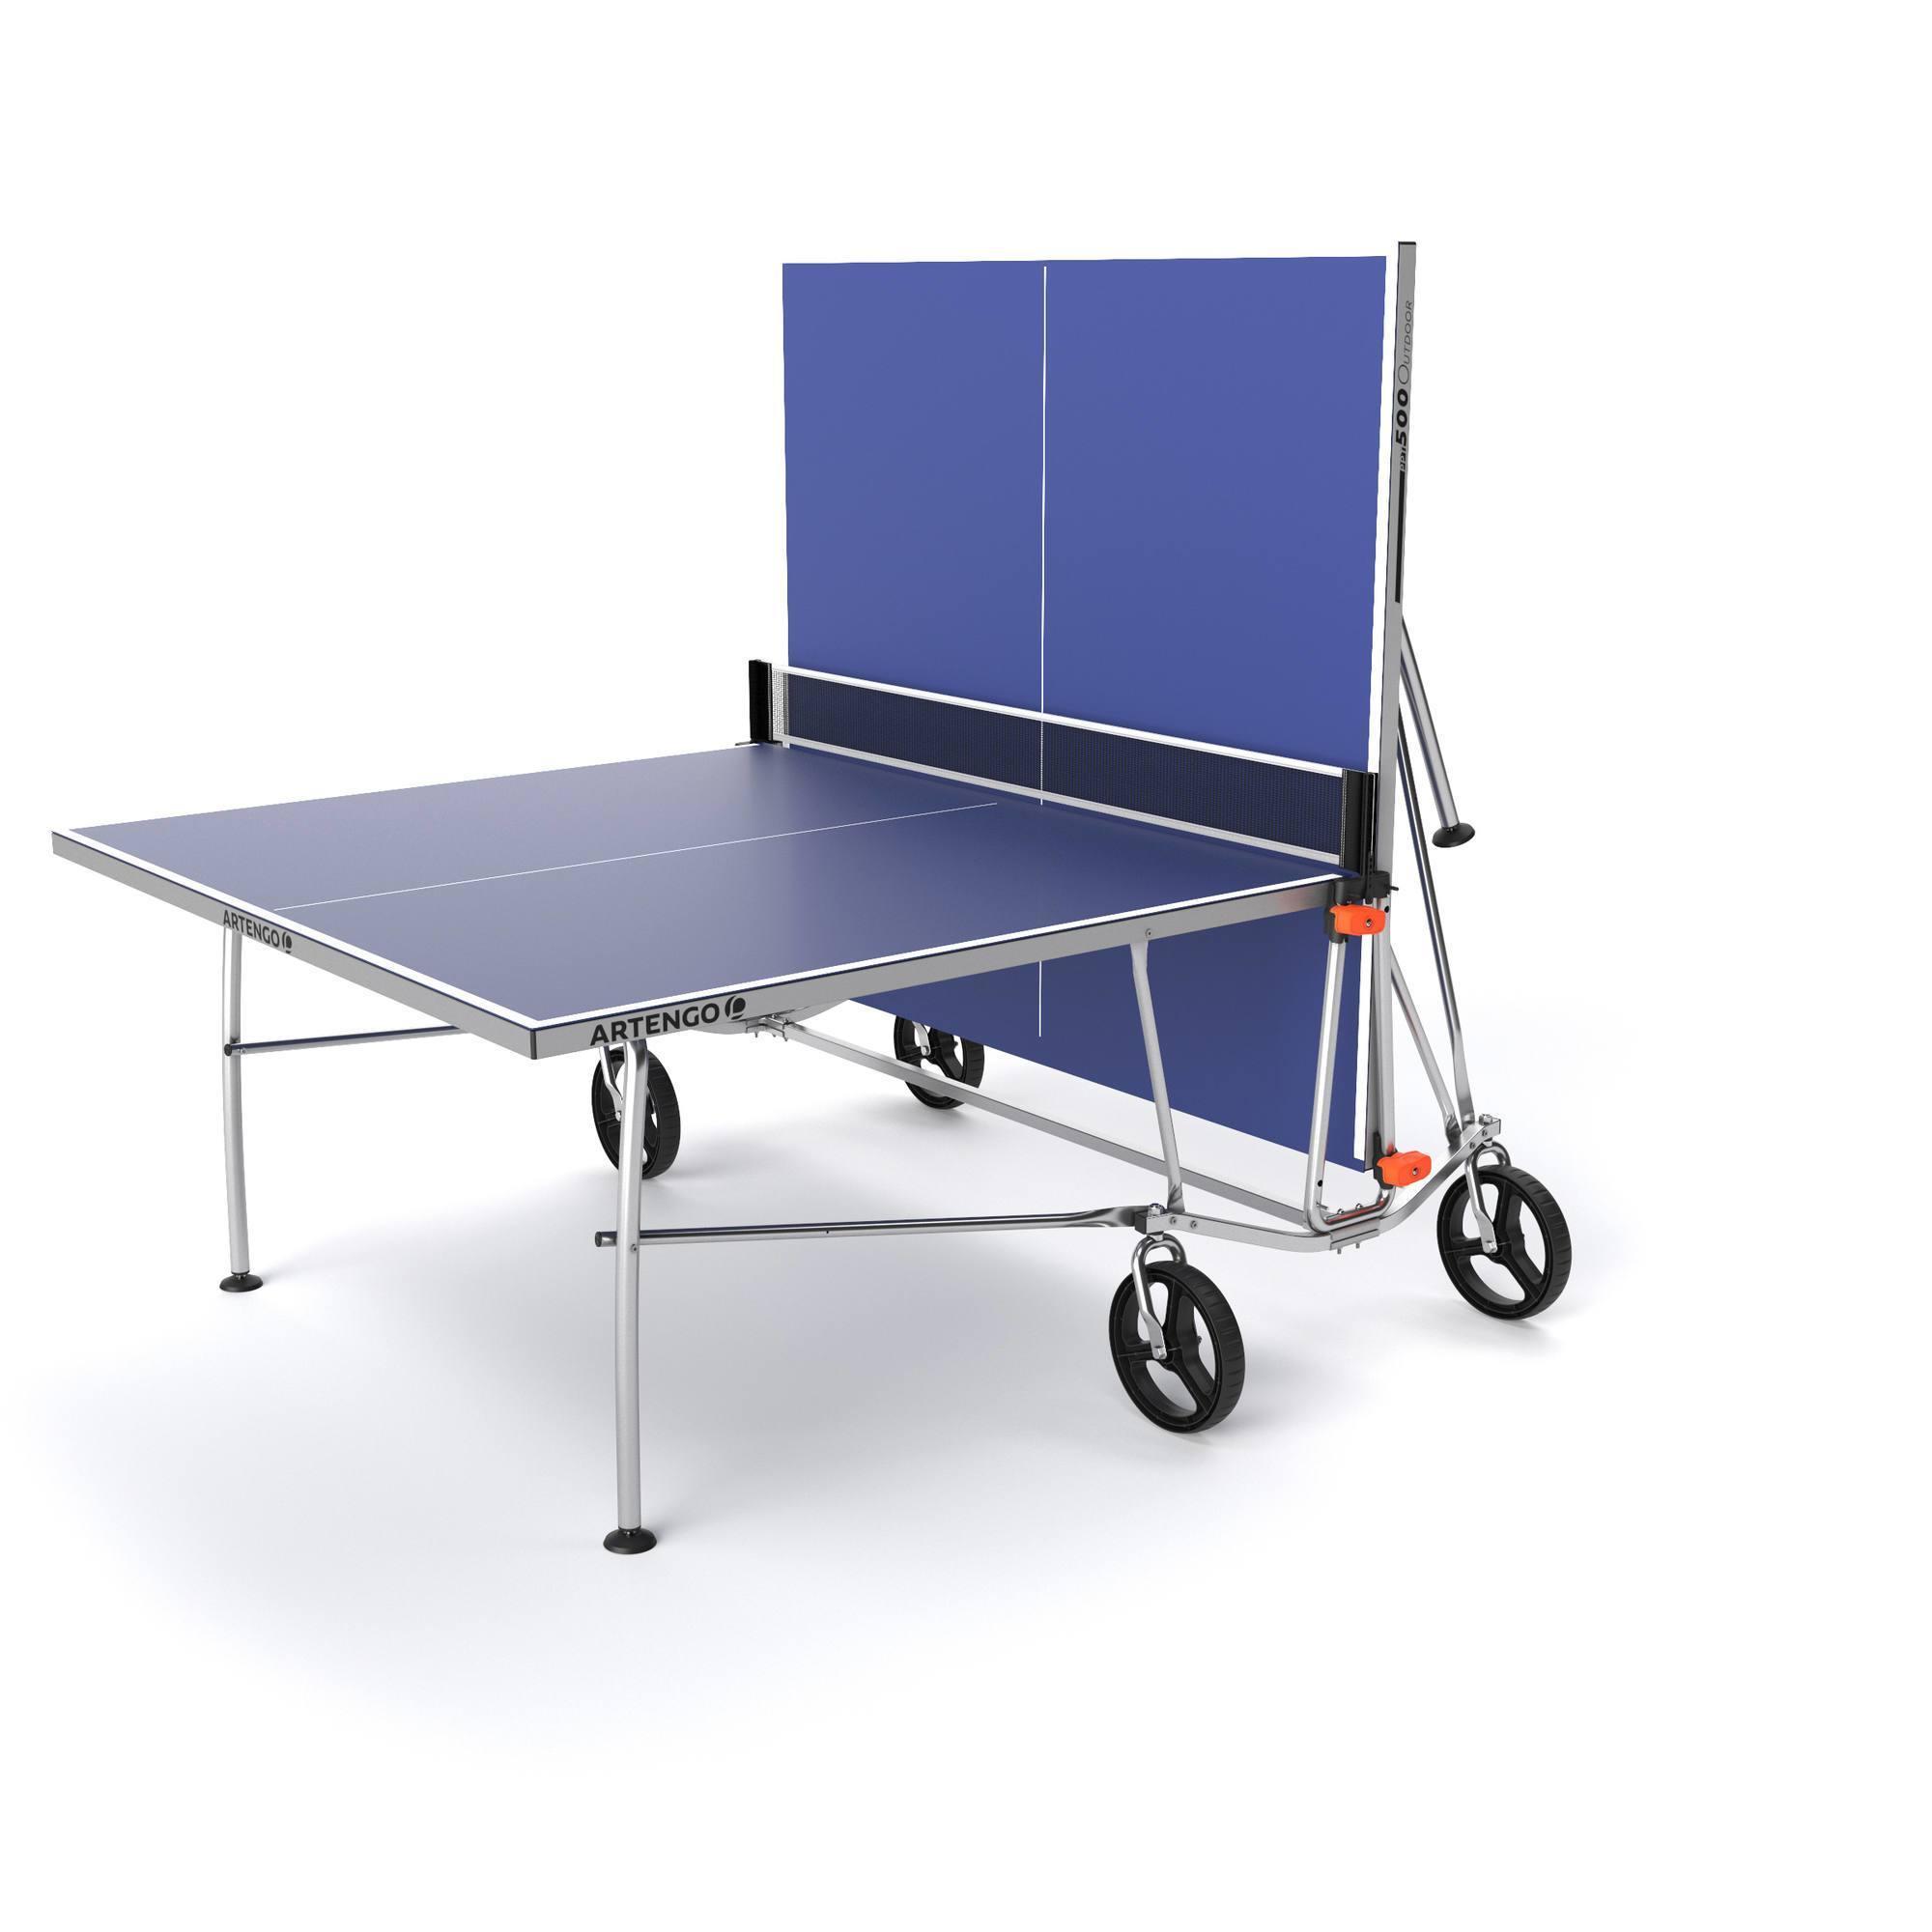 TABLE DE TENNIS DE TABLE FREE PPT 500 / FT 730 OUTDOOR